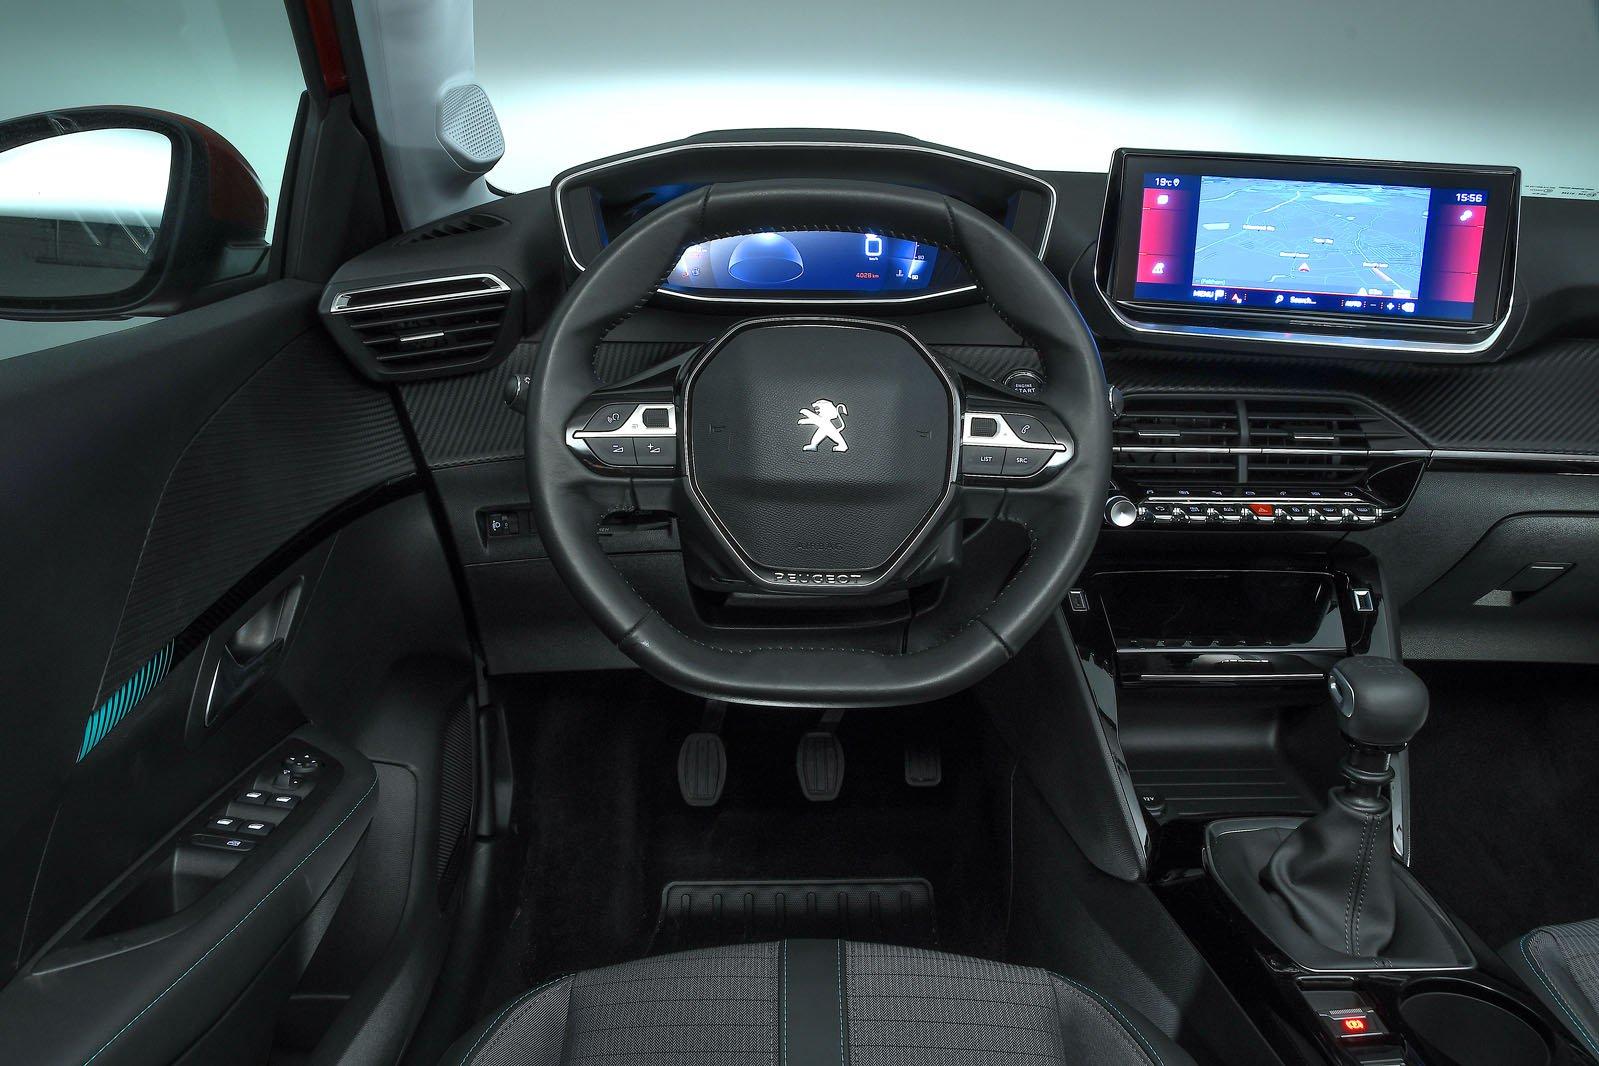 Peugeot 208 2019 dashboard (LHD)